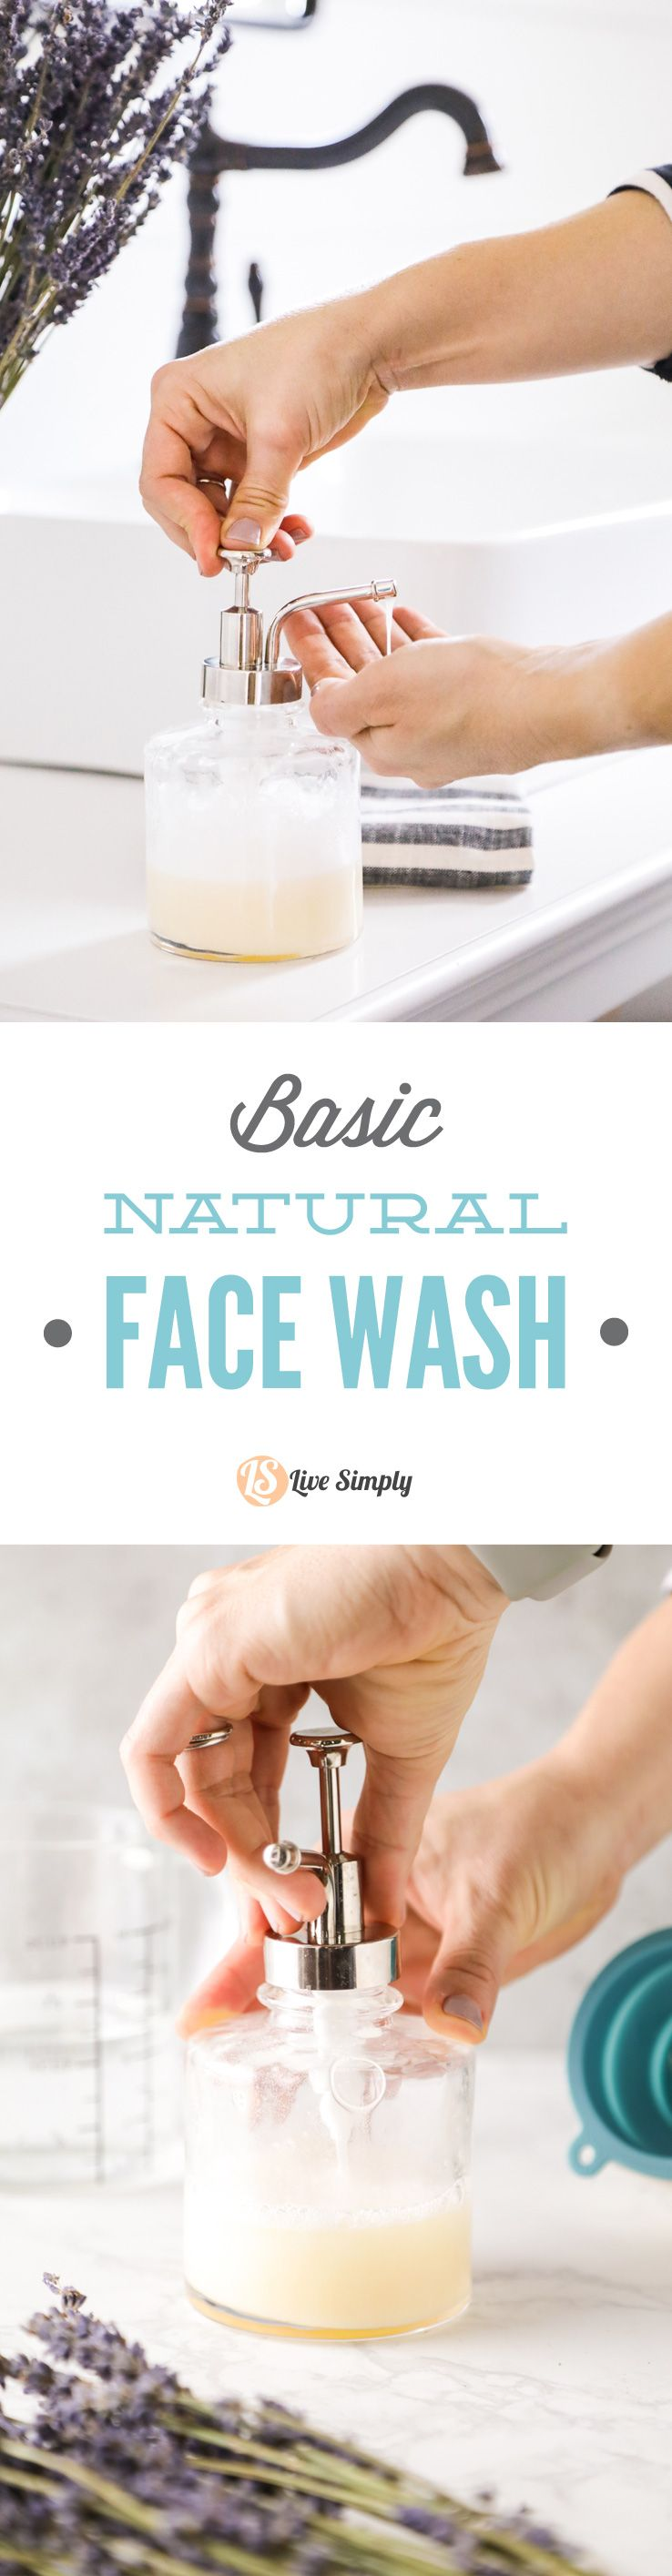 Basic Natural Face Wash + Four Ways to Customize Homemade